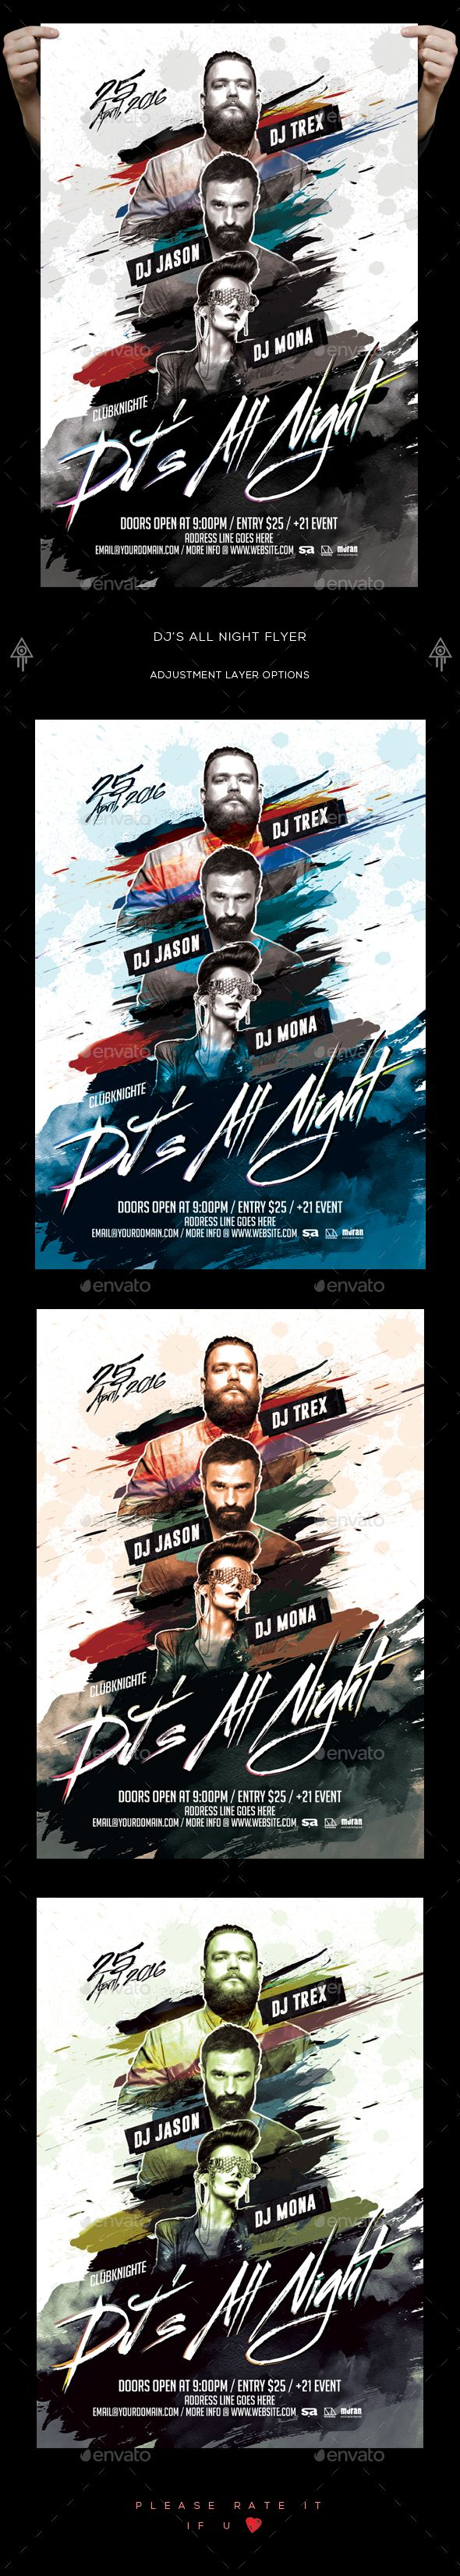 Dj's All Night Flyer  — PSD Template #futuristic #music • Download ➝ https://graphicriver.net/item/djs-all-night-flyer/18468289?ref=pxcr